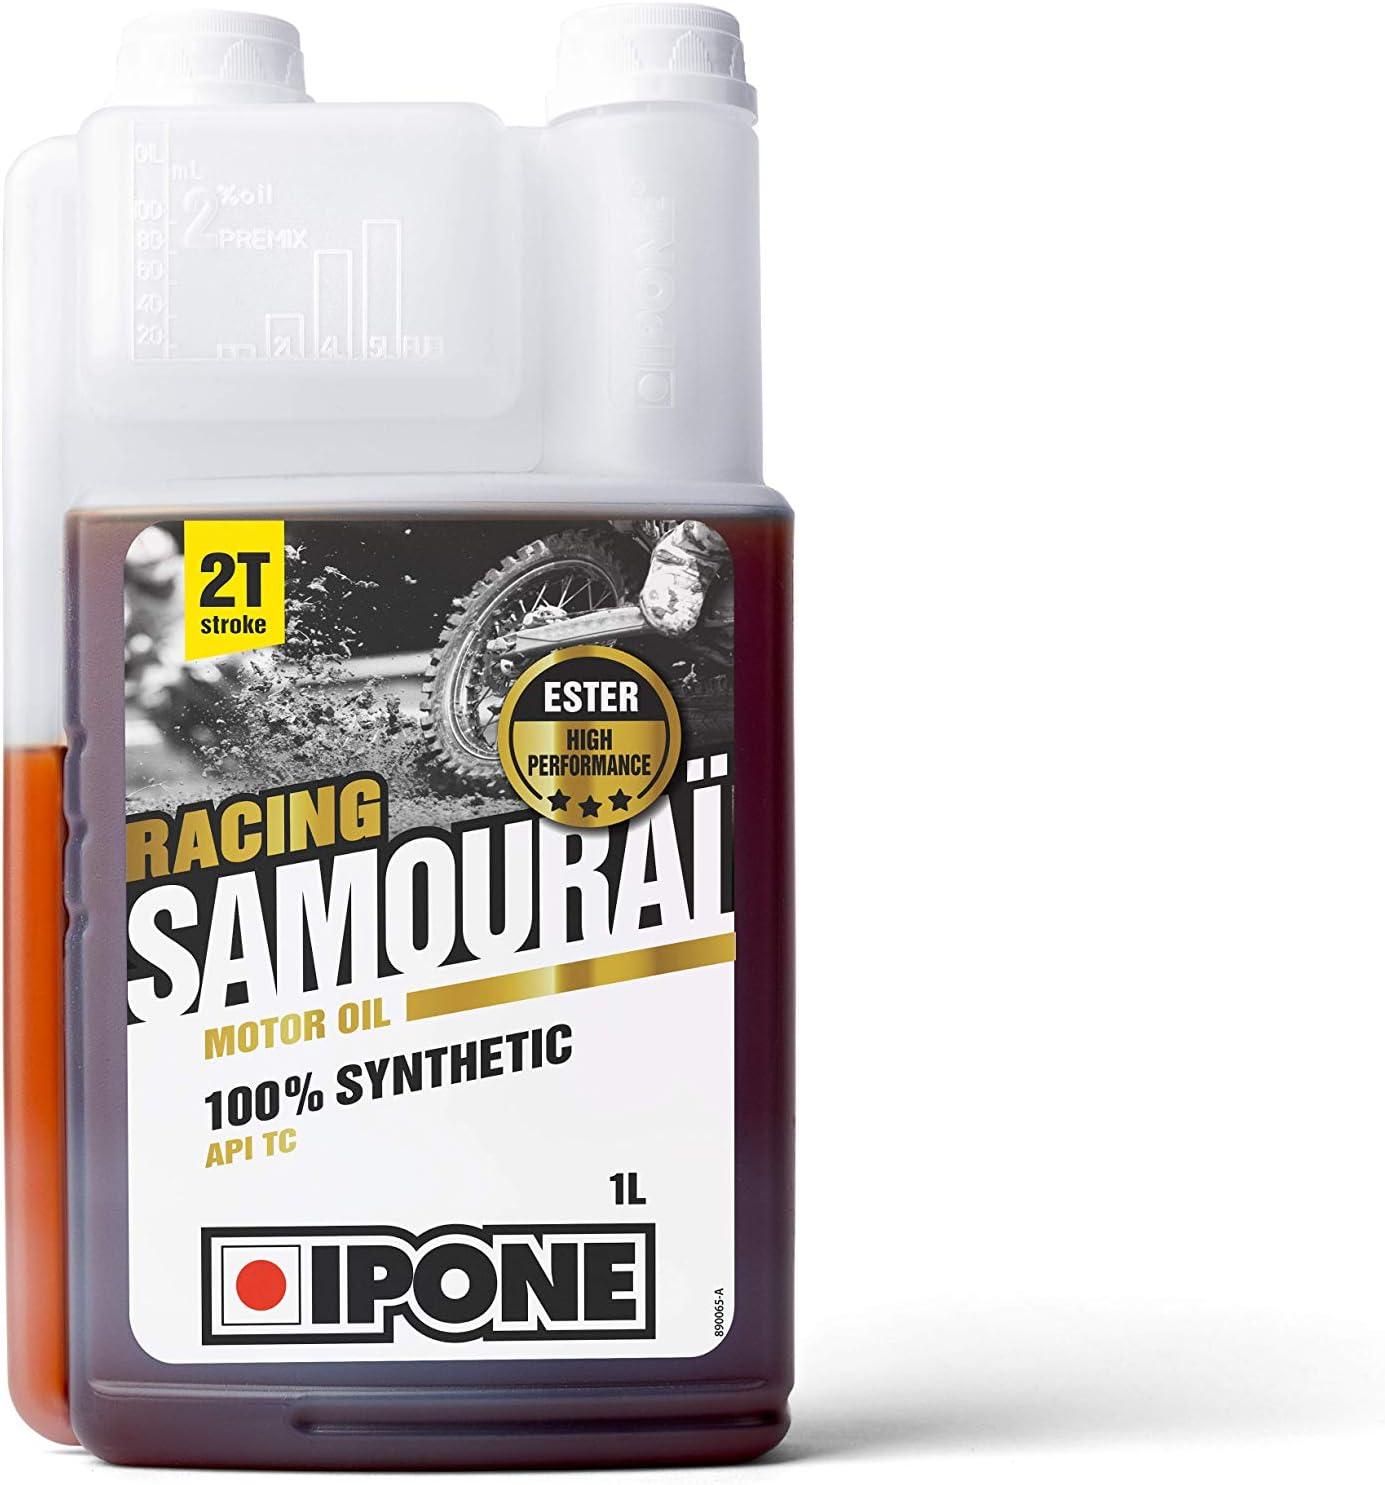 Ipone s28480- Aceite 2T samurái 100%, síntesis, Bidon